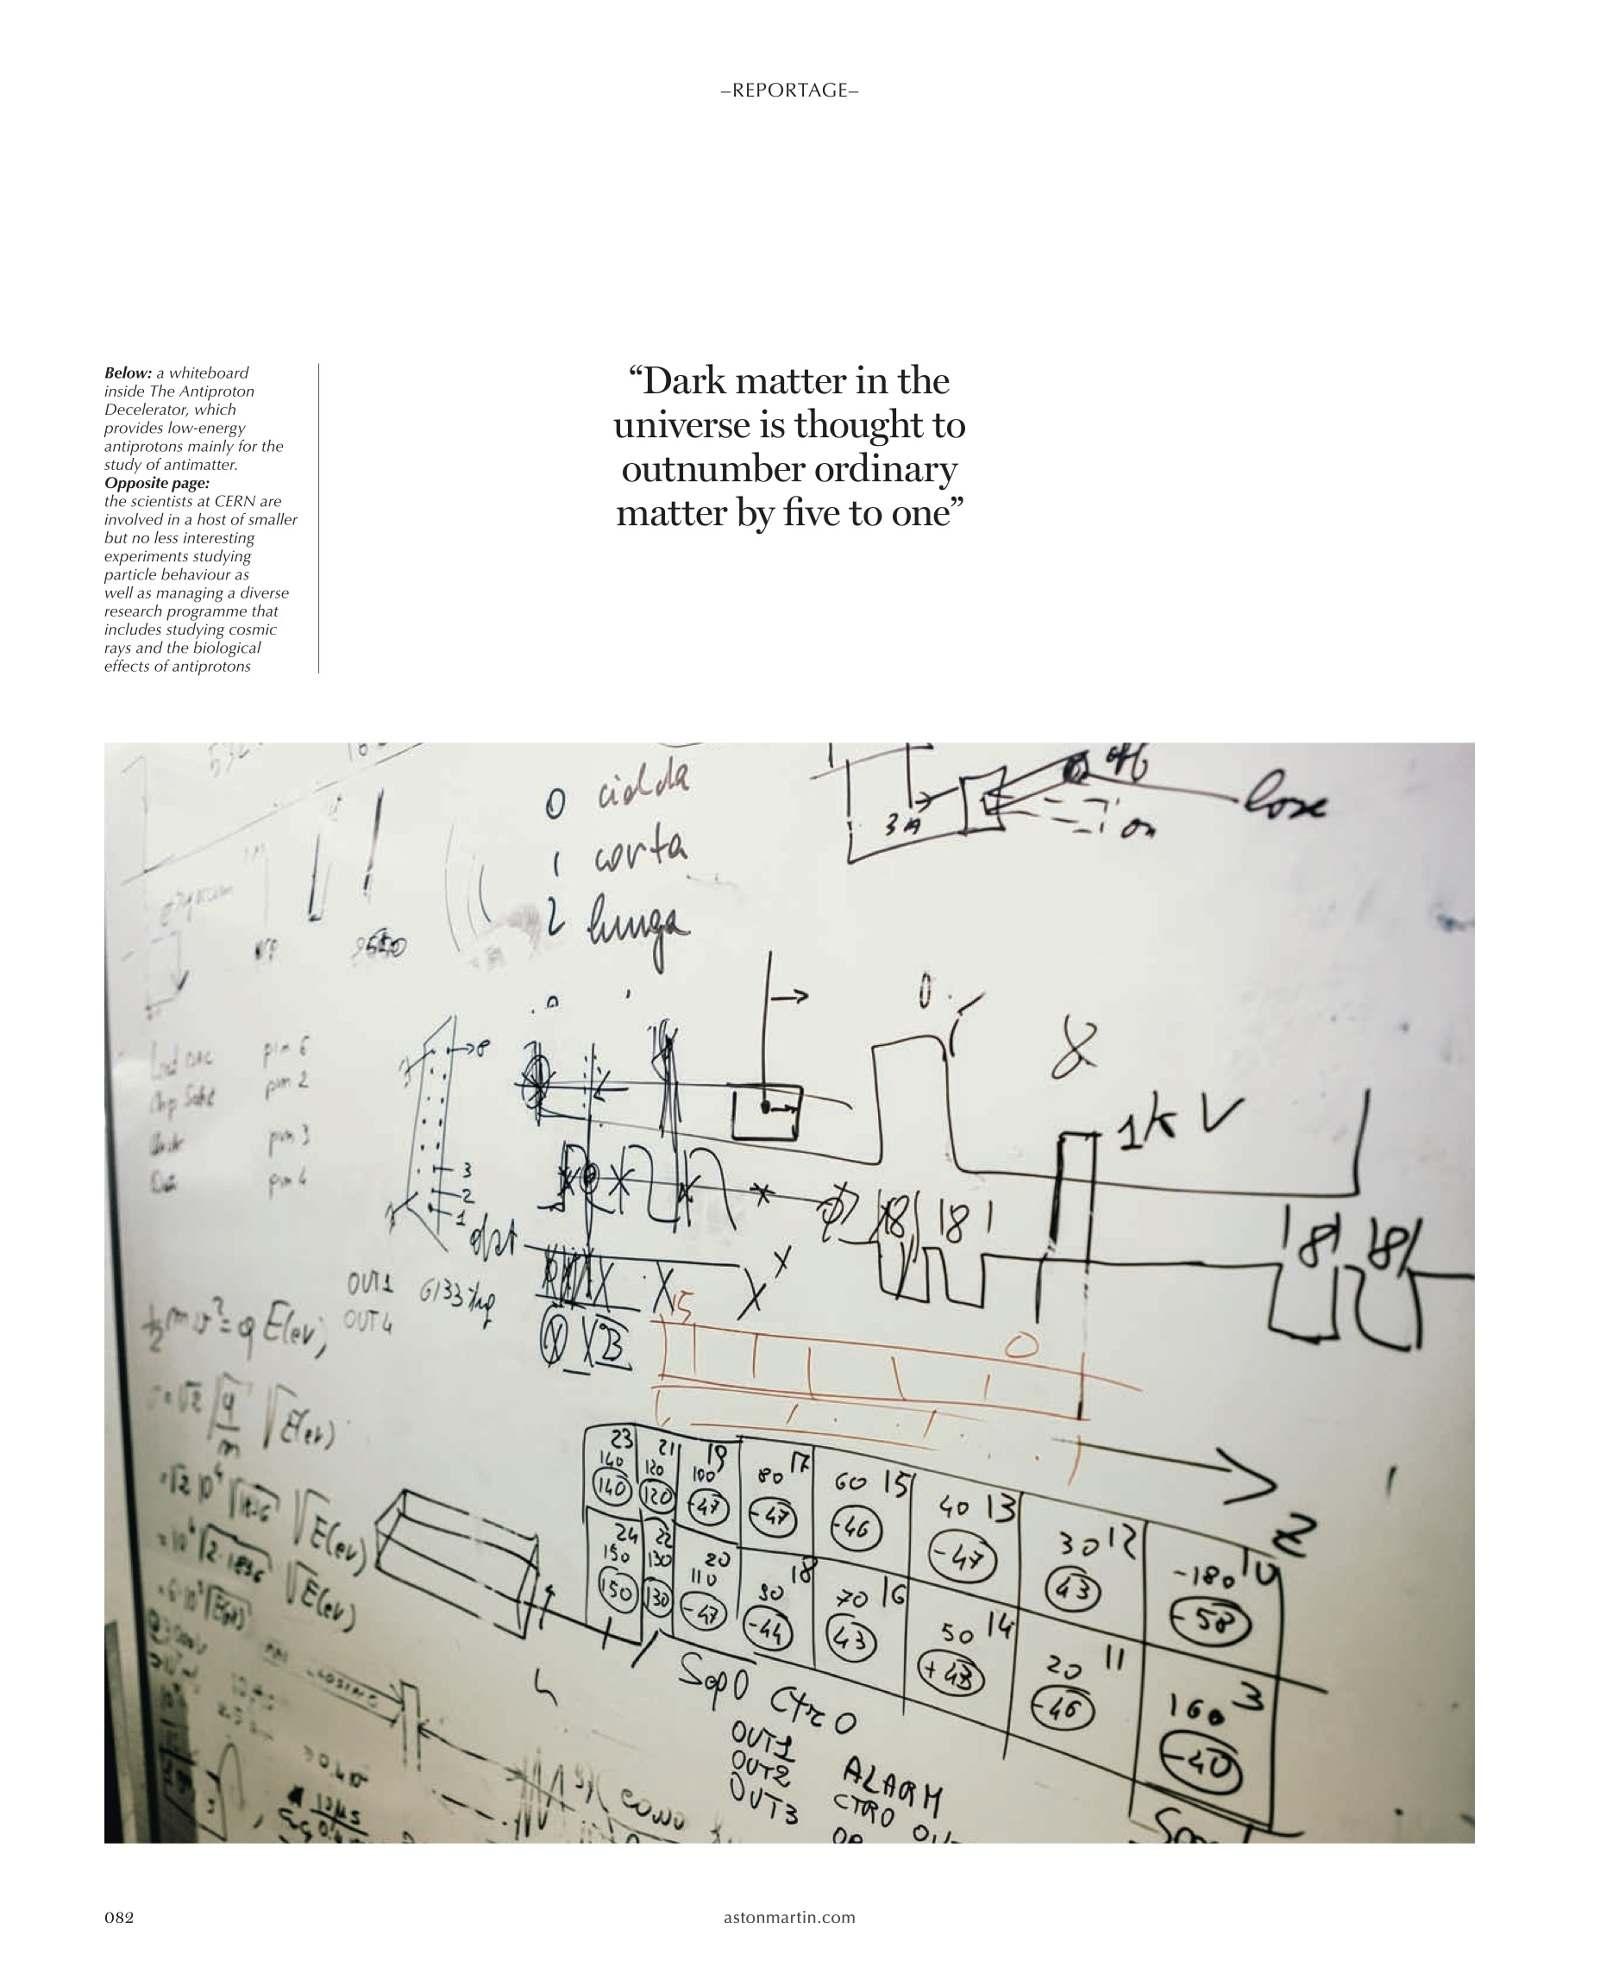 Cover Luca Locatellis Cern In Aston Martin Magazine Electrical Wiring Diagram September 2015 Filed Under Covertearsheetluca Locatelliluca Locatelli Tearsheetcerncollideraston